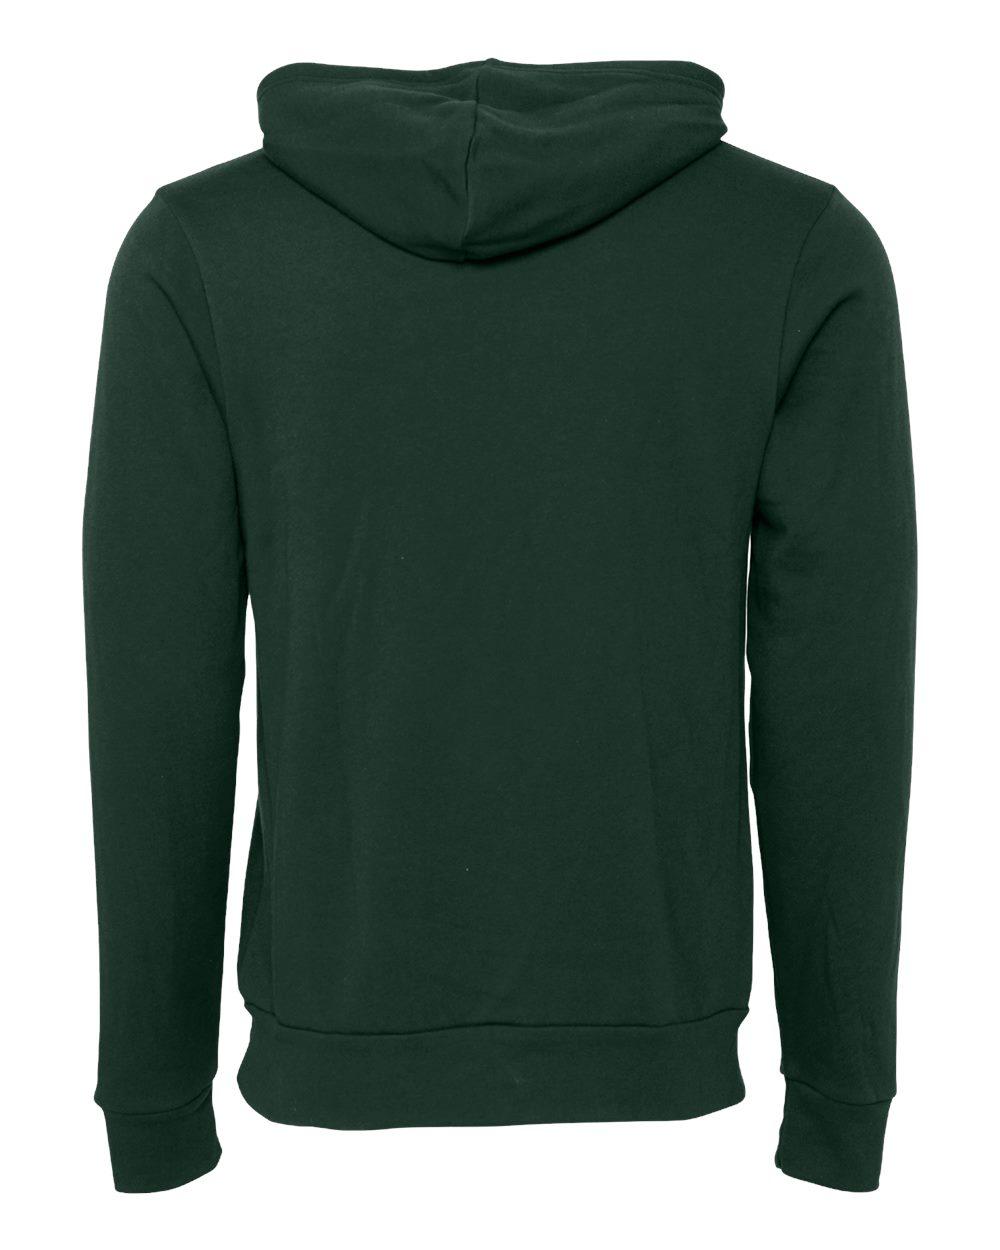 Bella-Canvas-Unisex-Sponge-Hooded-Pullover-Sweatshirt-Blank-3719-up-to-2XL thumbnail 37